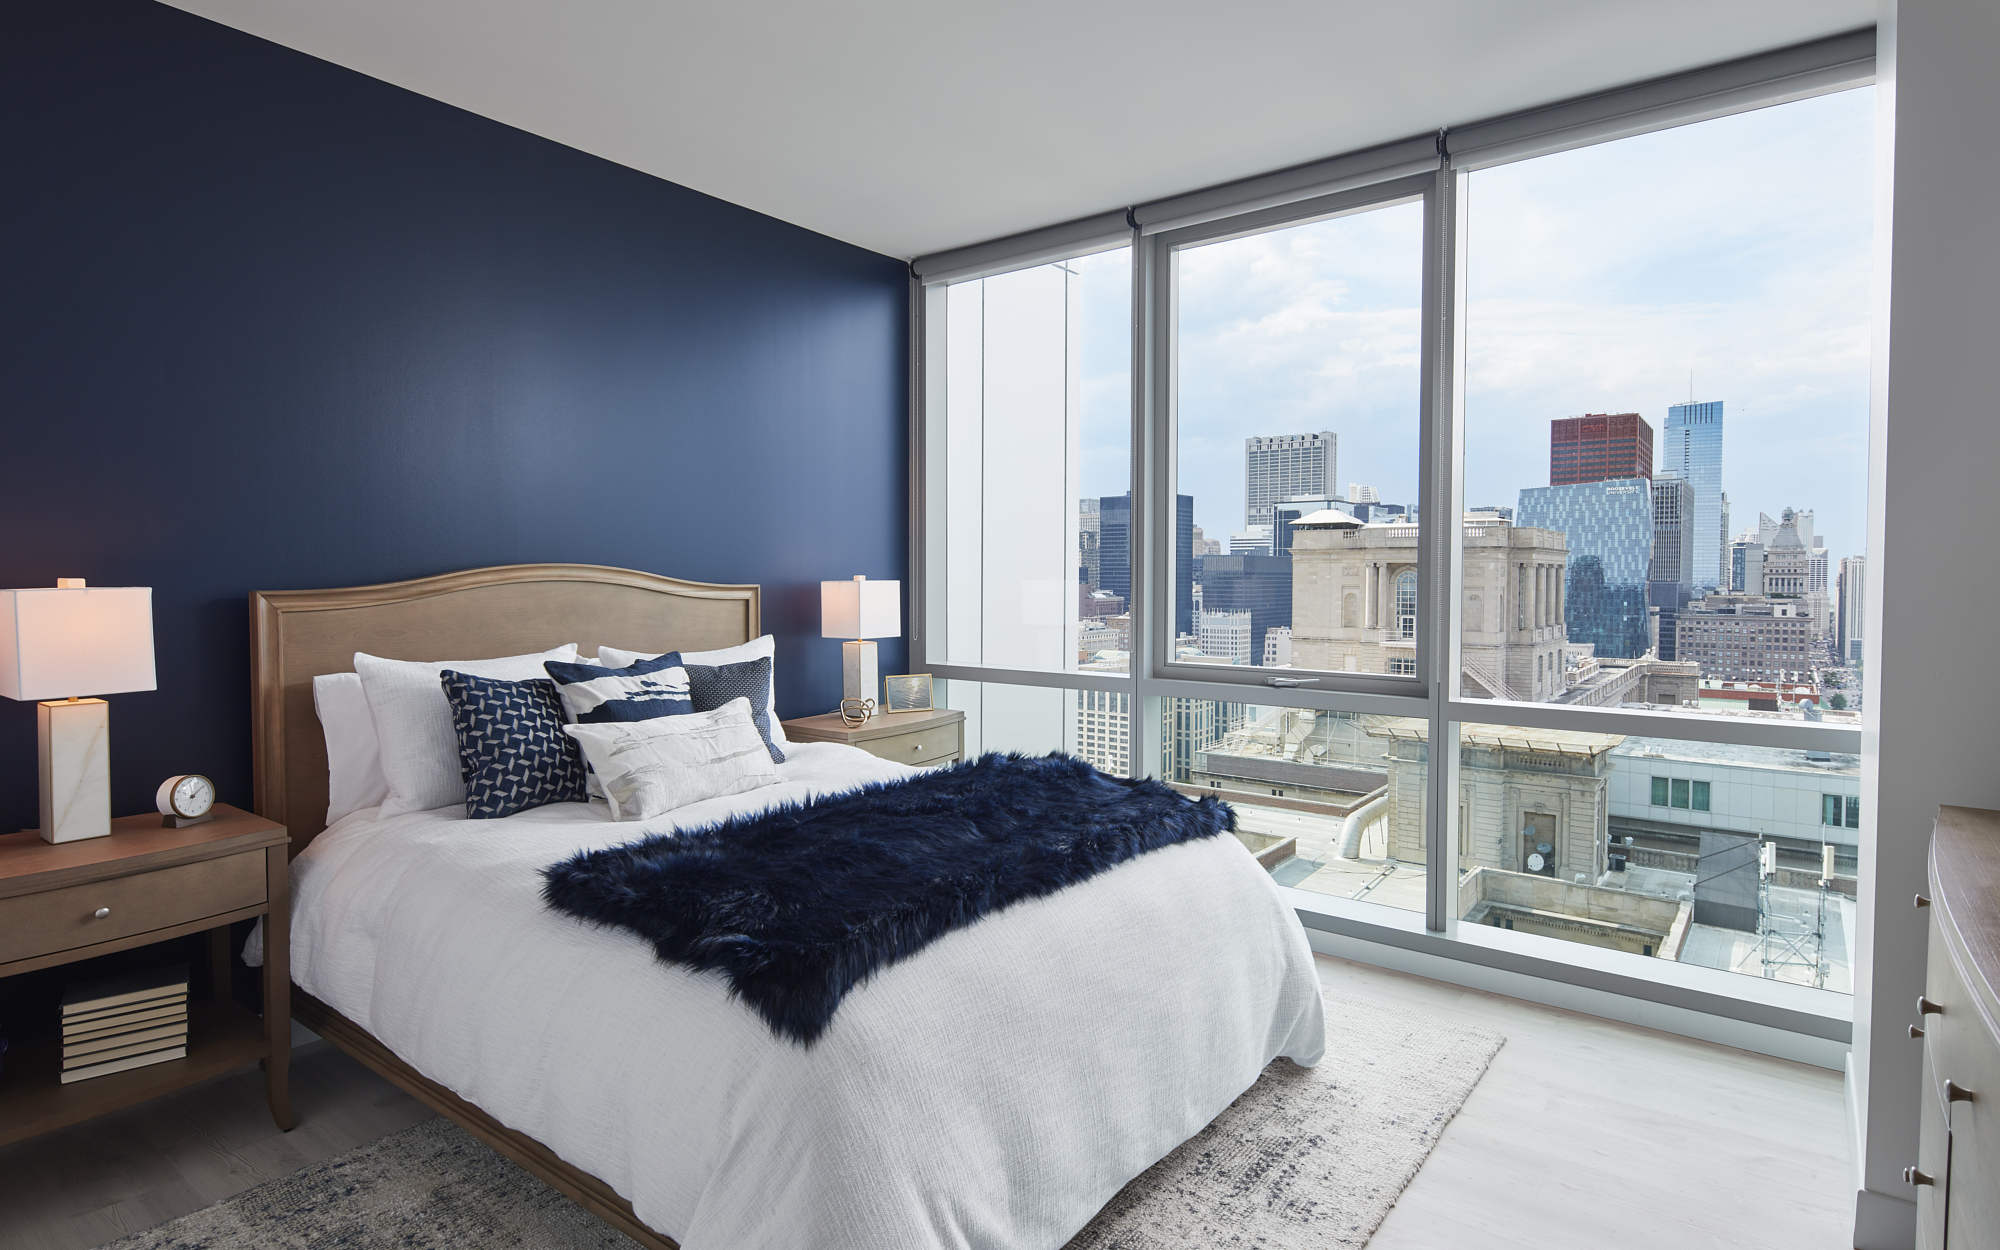 Essex bedroom example 2 open window with city view